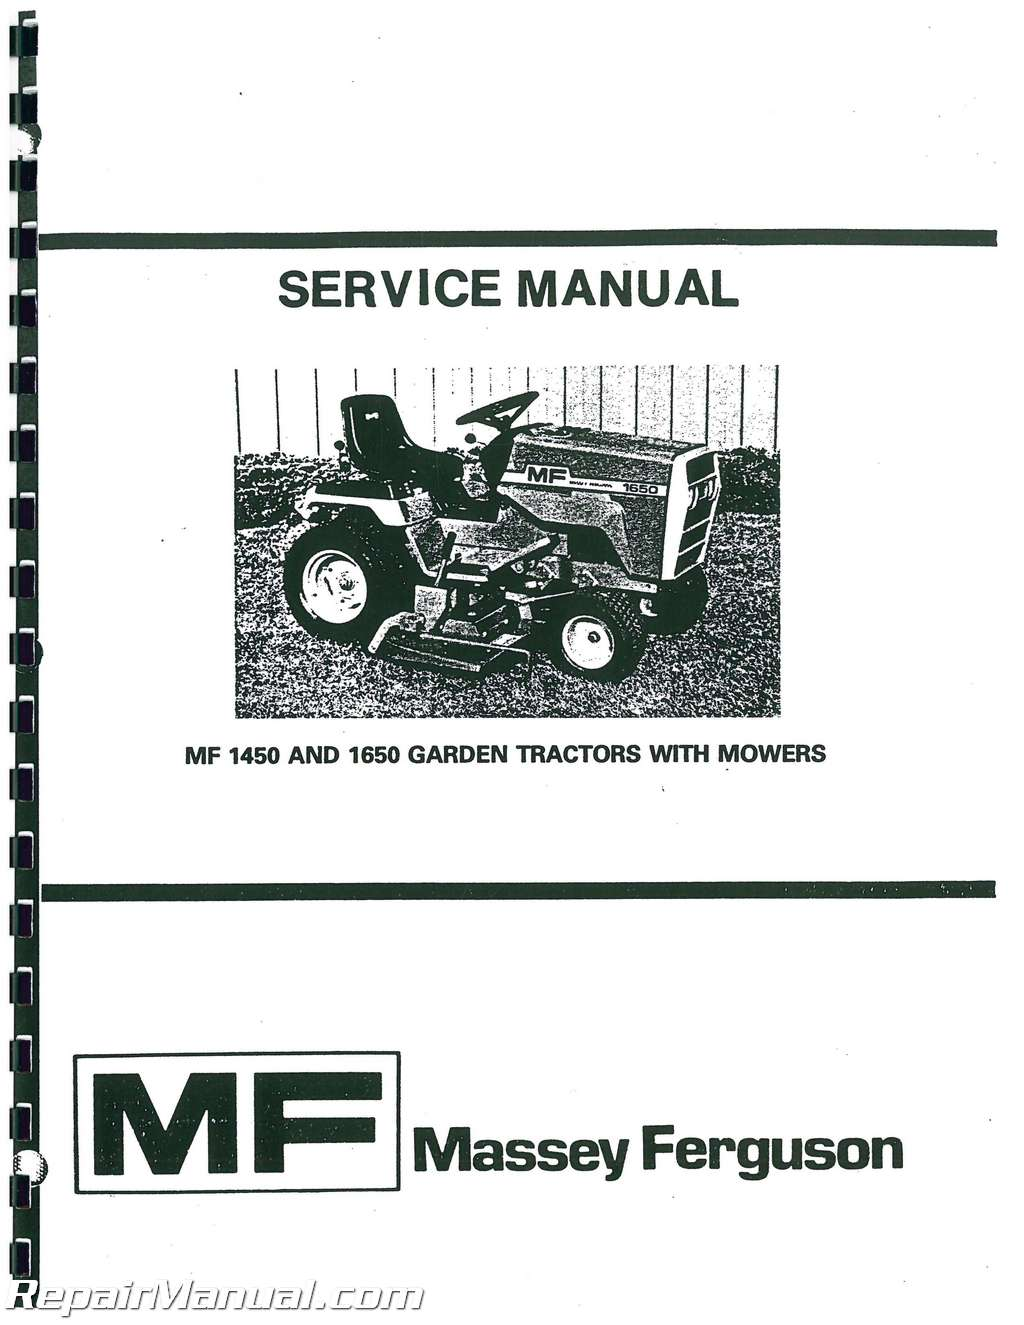 massey ferguson 6120 service manual